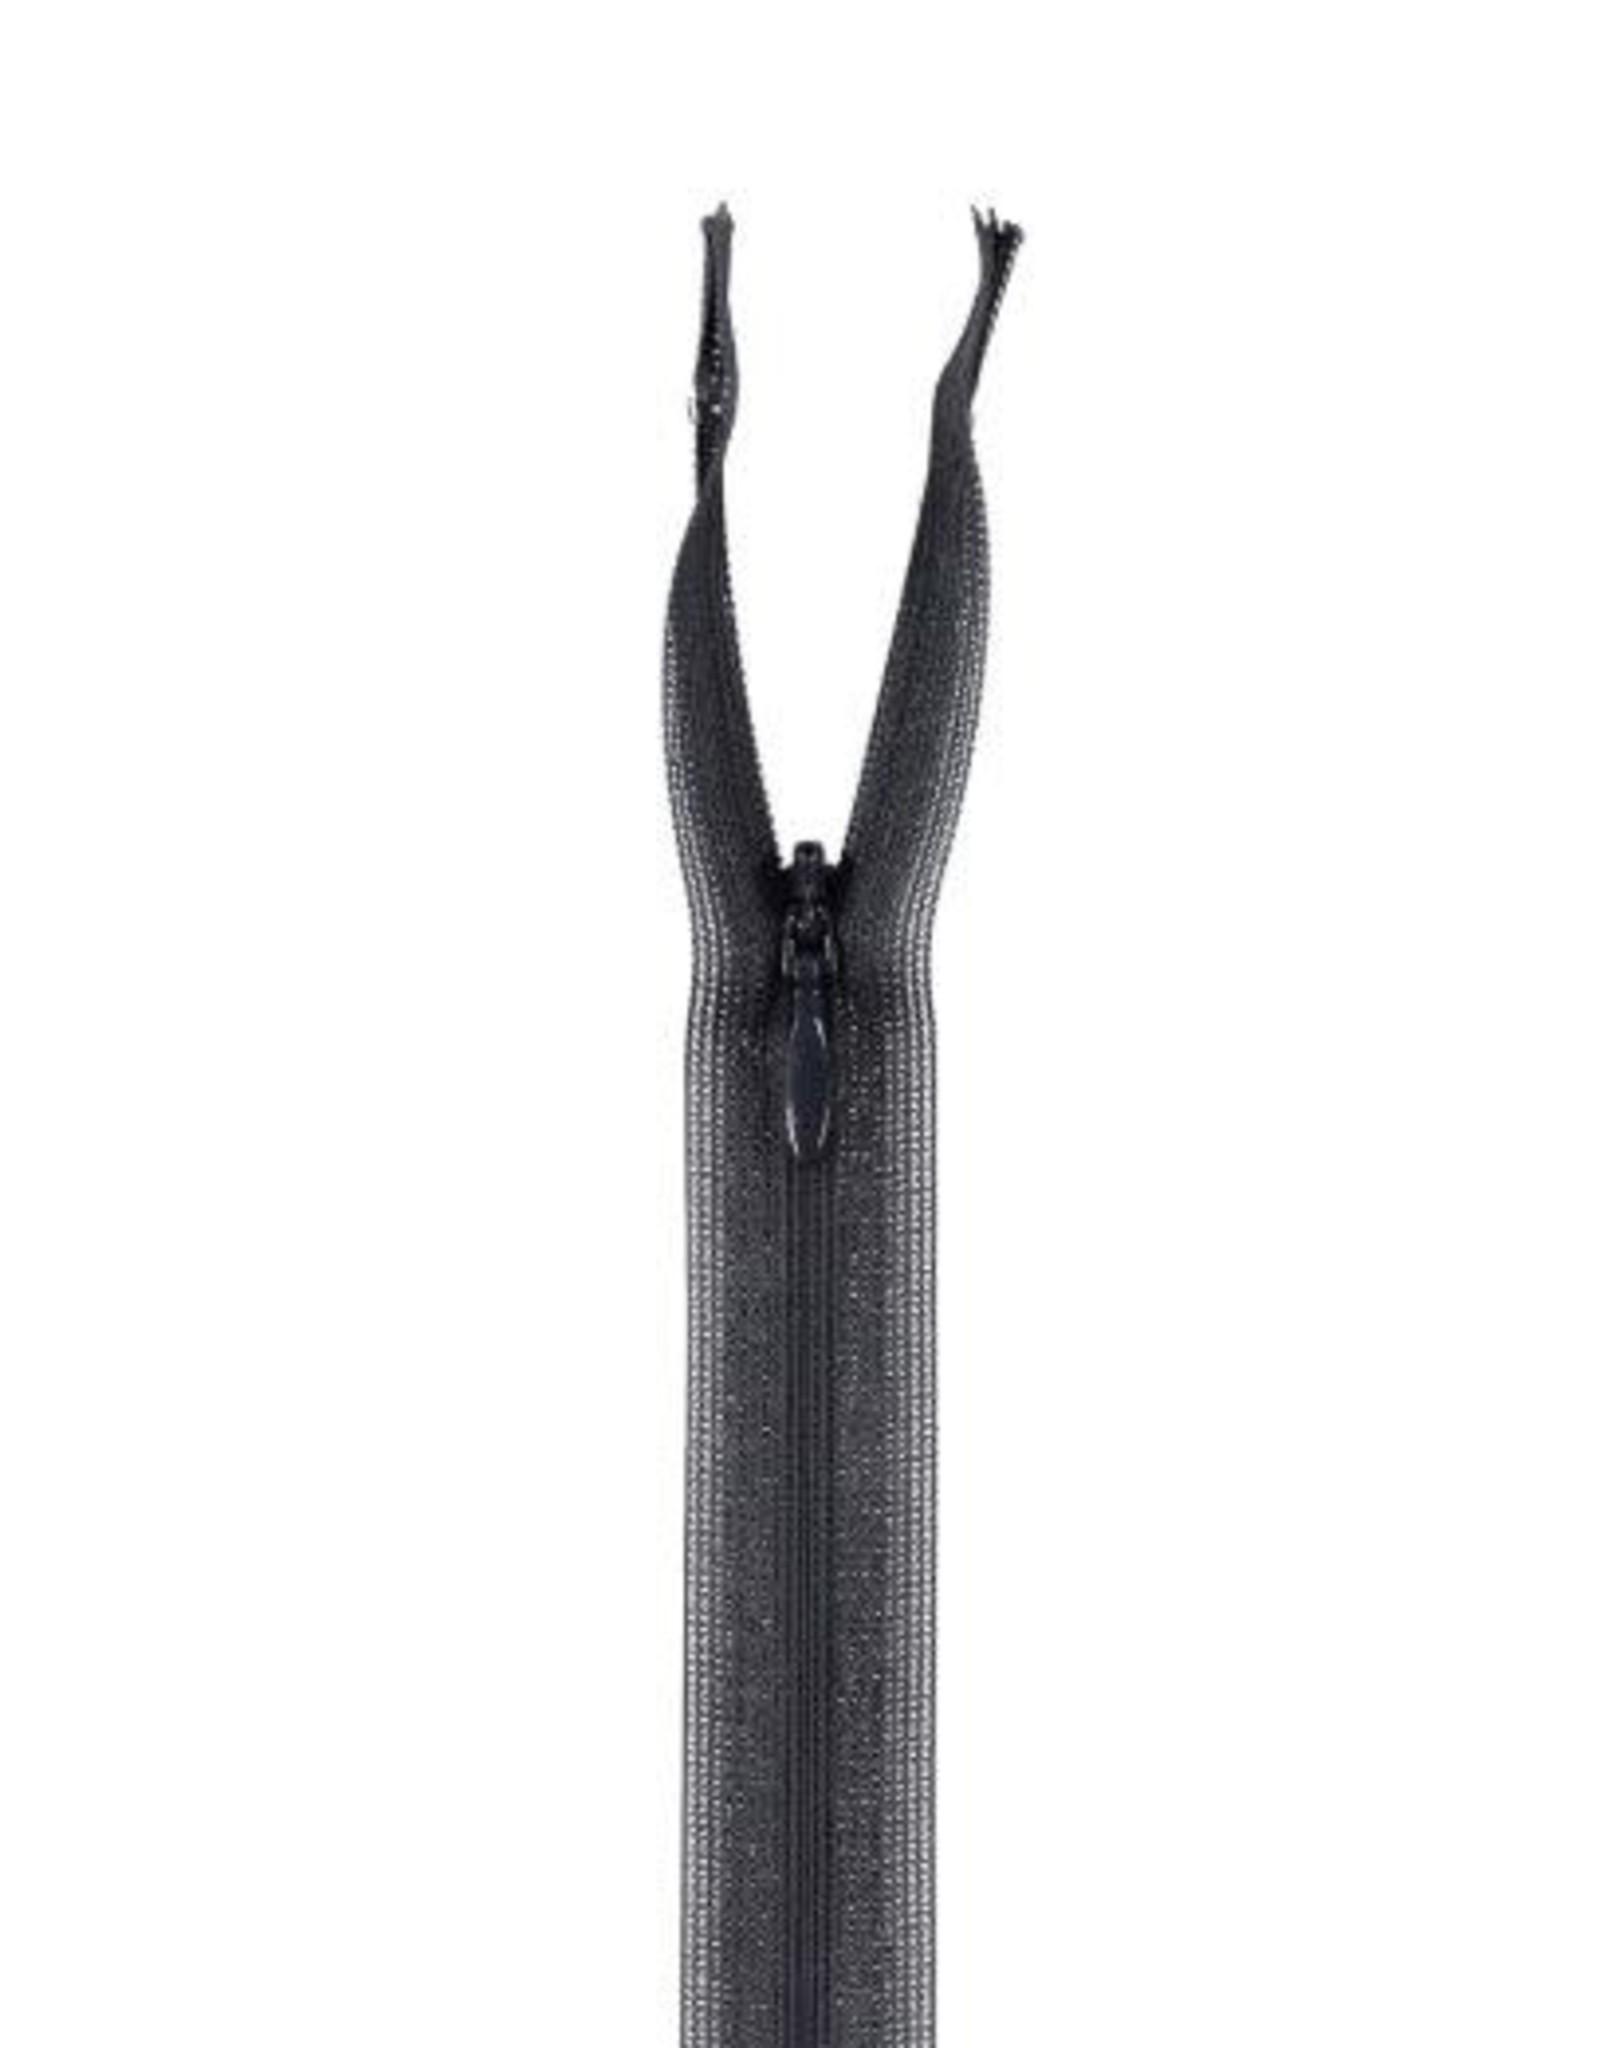 YKK NAADVERDEKTE RITS C NIET-DEELBAAR (p.1st) 071-40cm